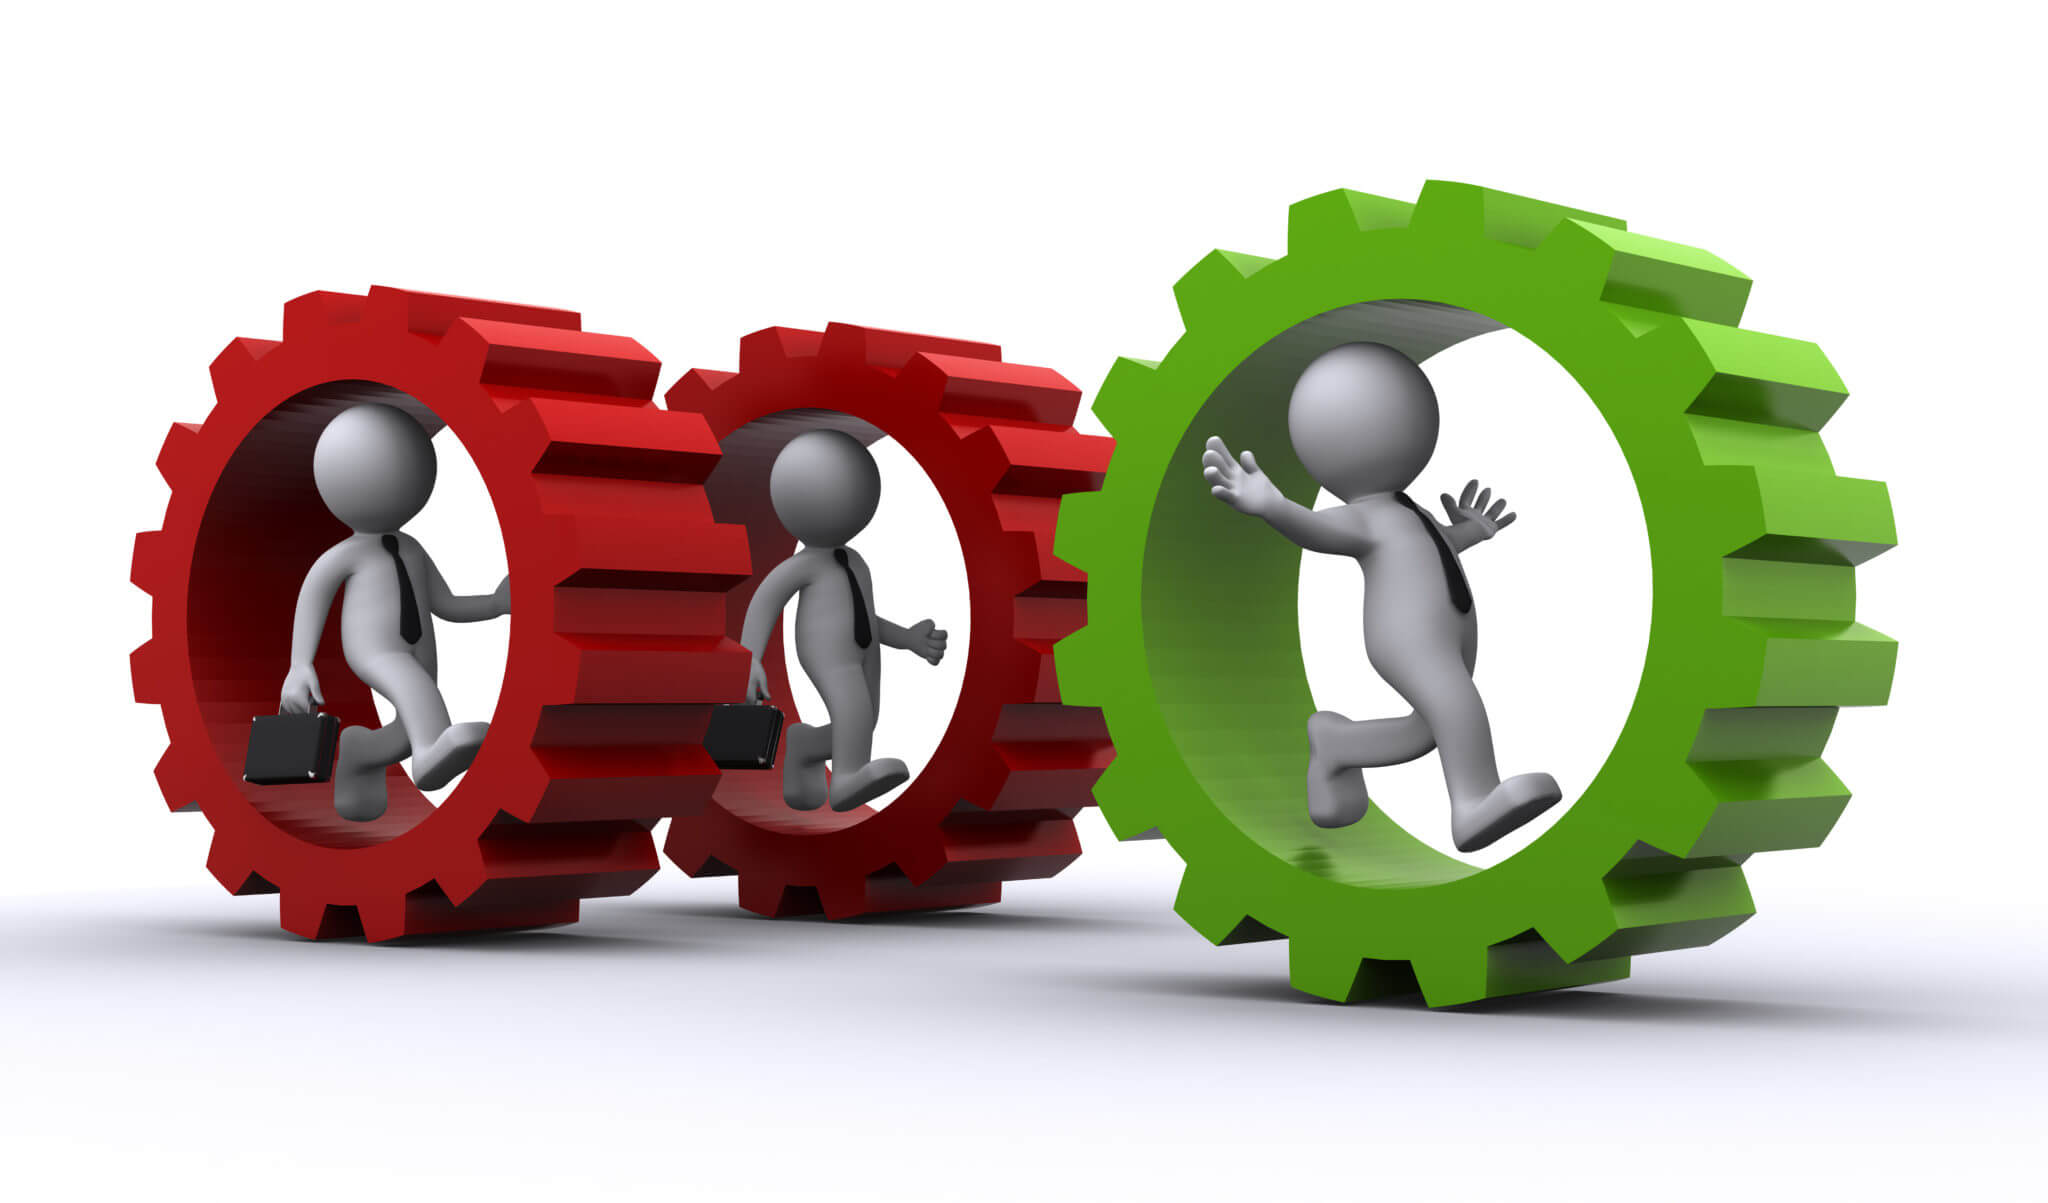 Achieve operational efficiency through predictive maintenance